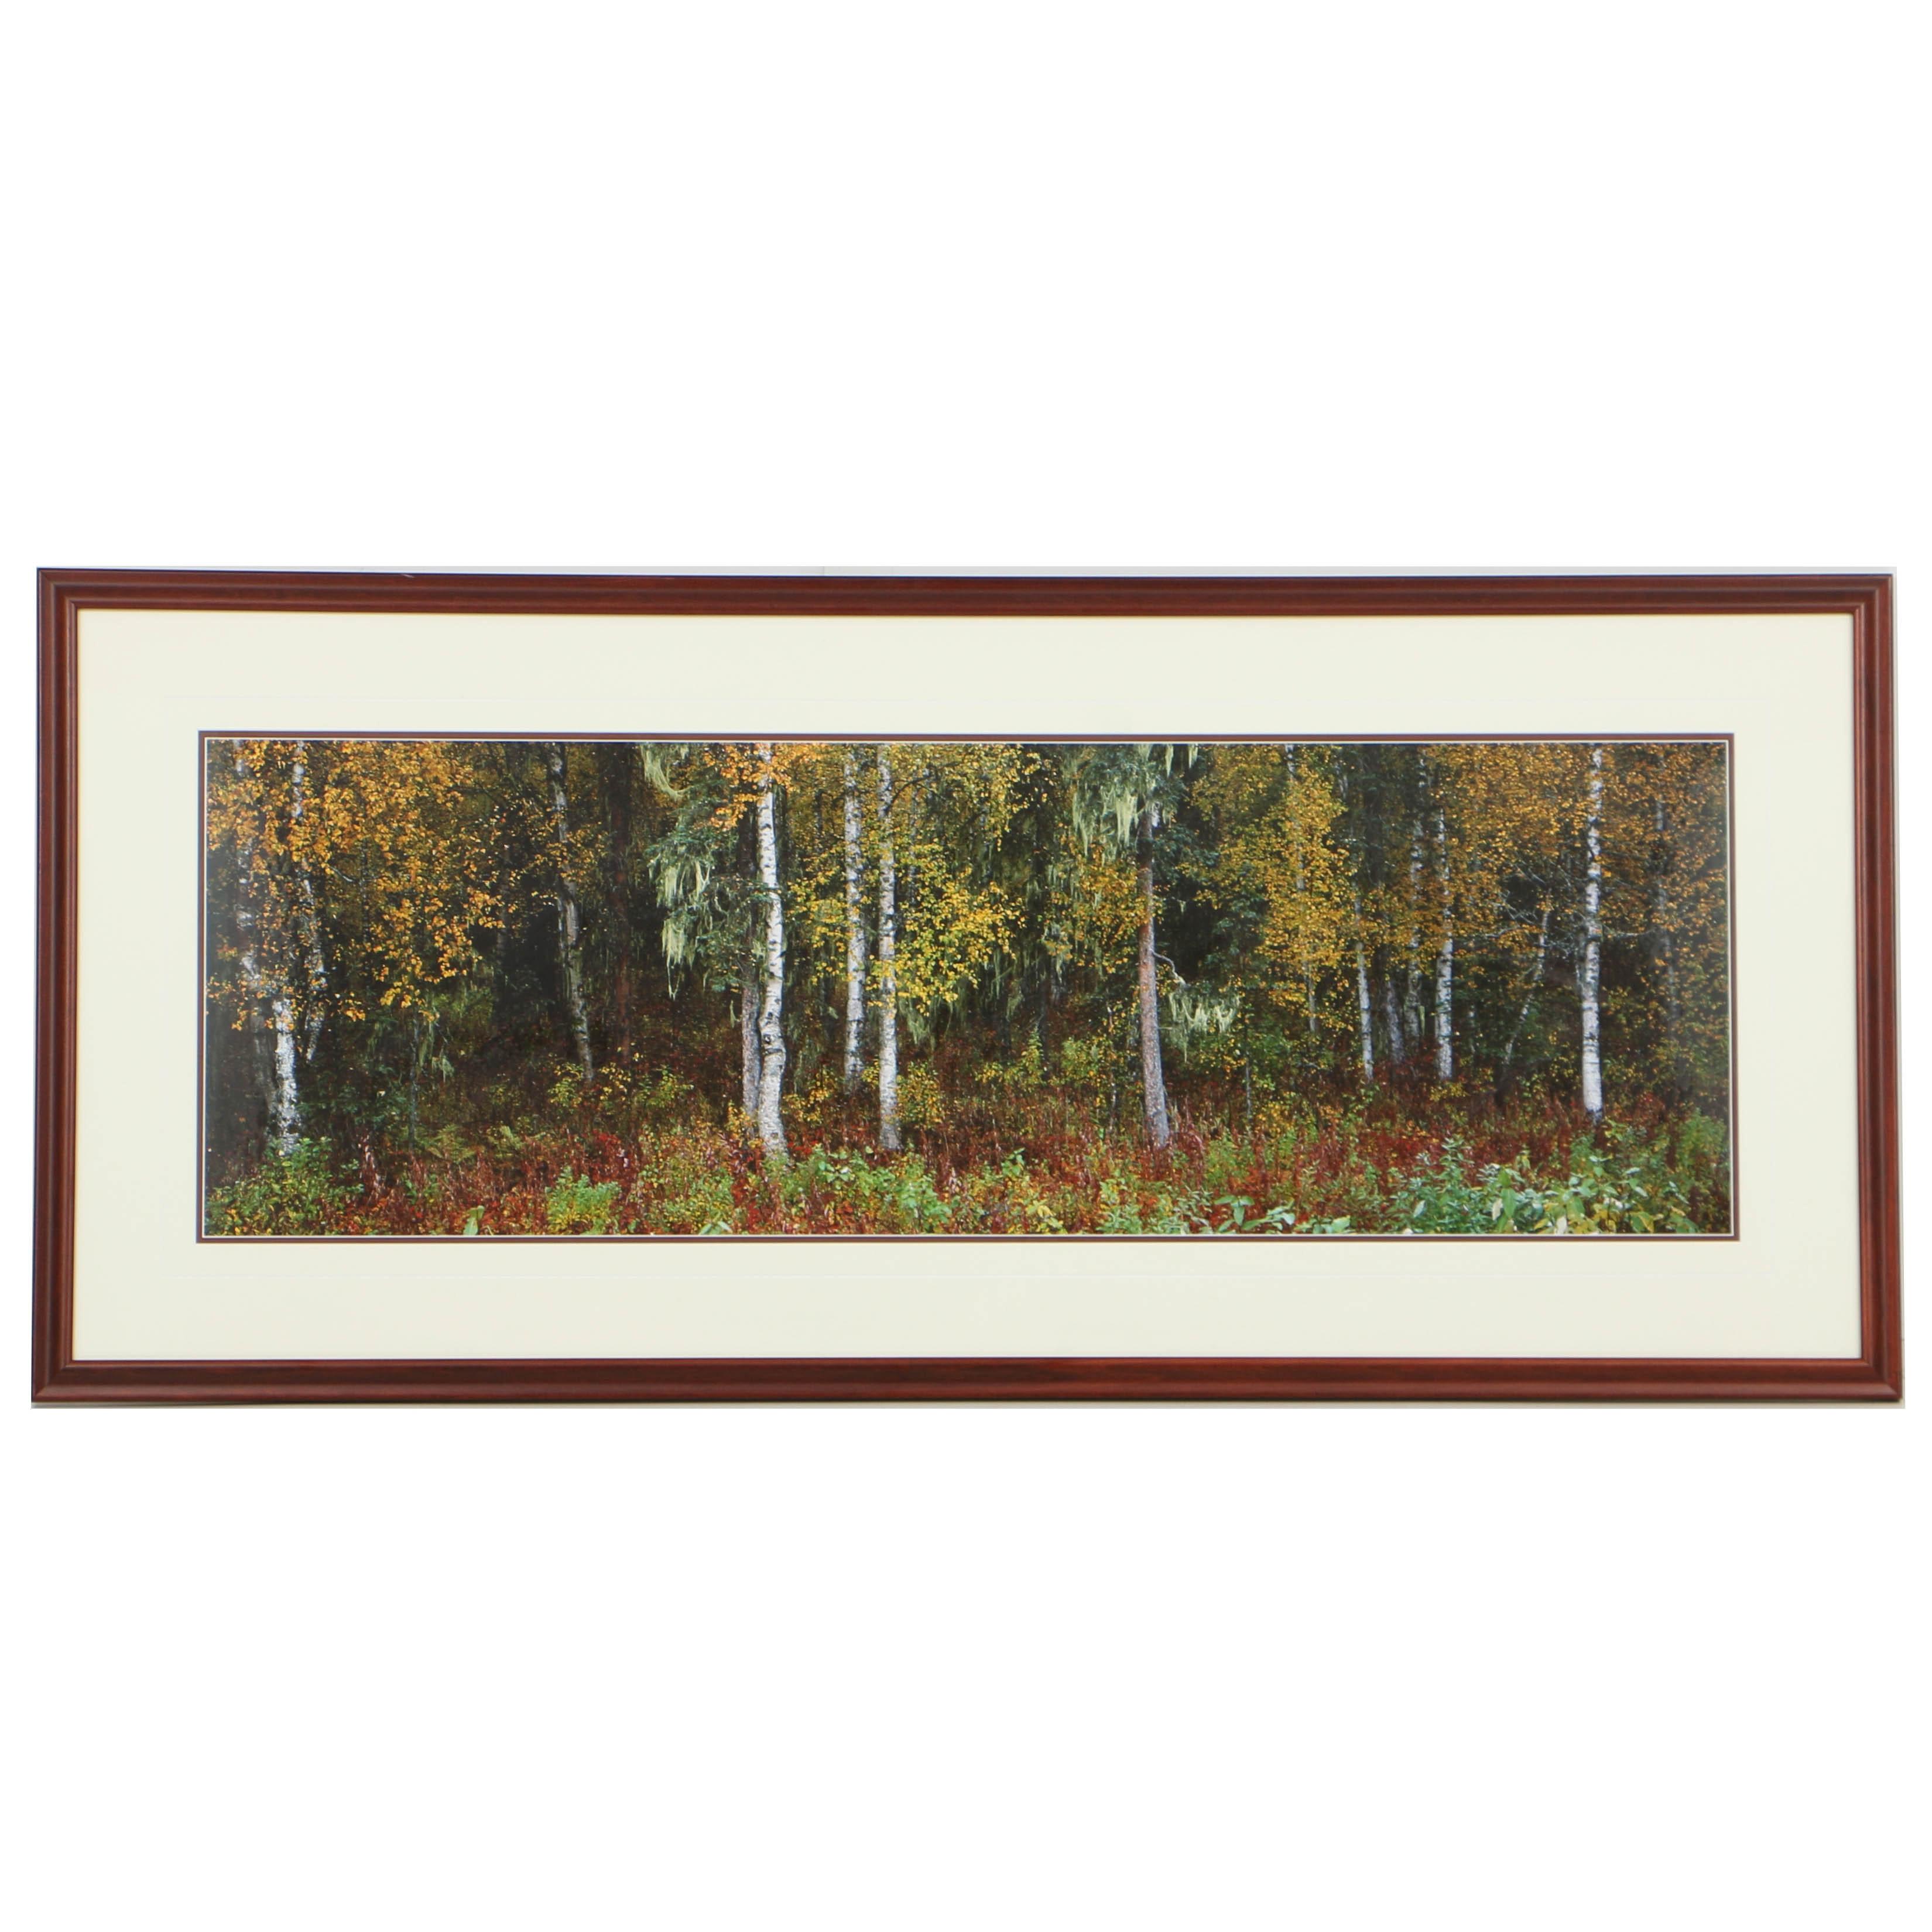 Thomas D. Mangelsen Panoramic Color Photograph of a Forest Landscape